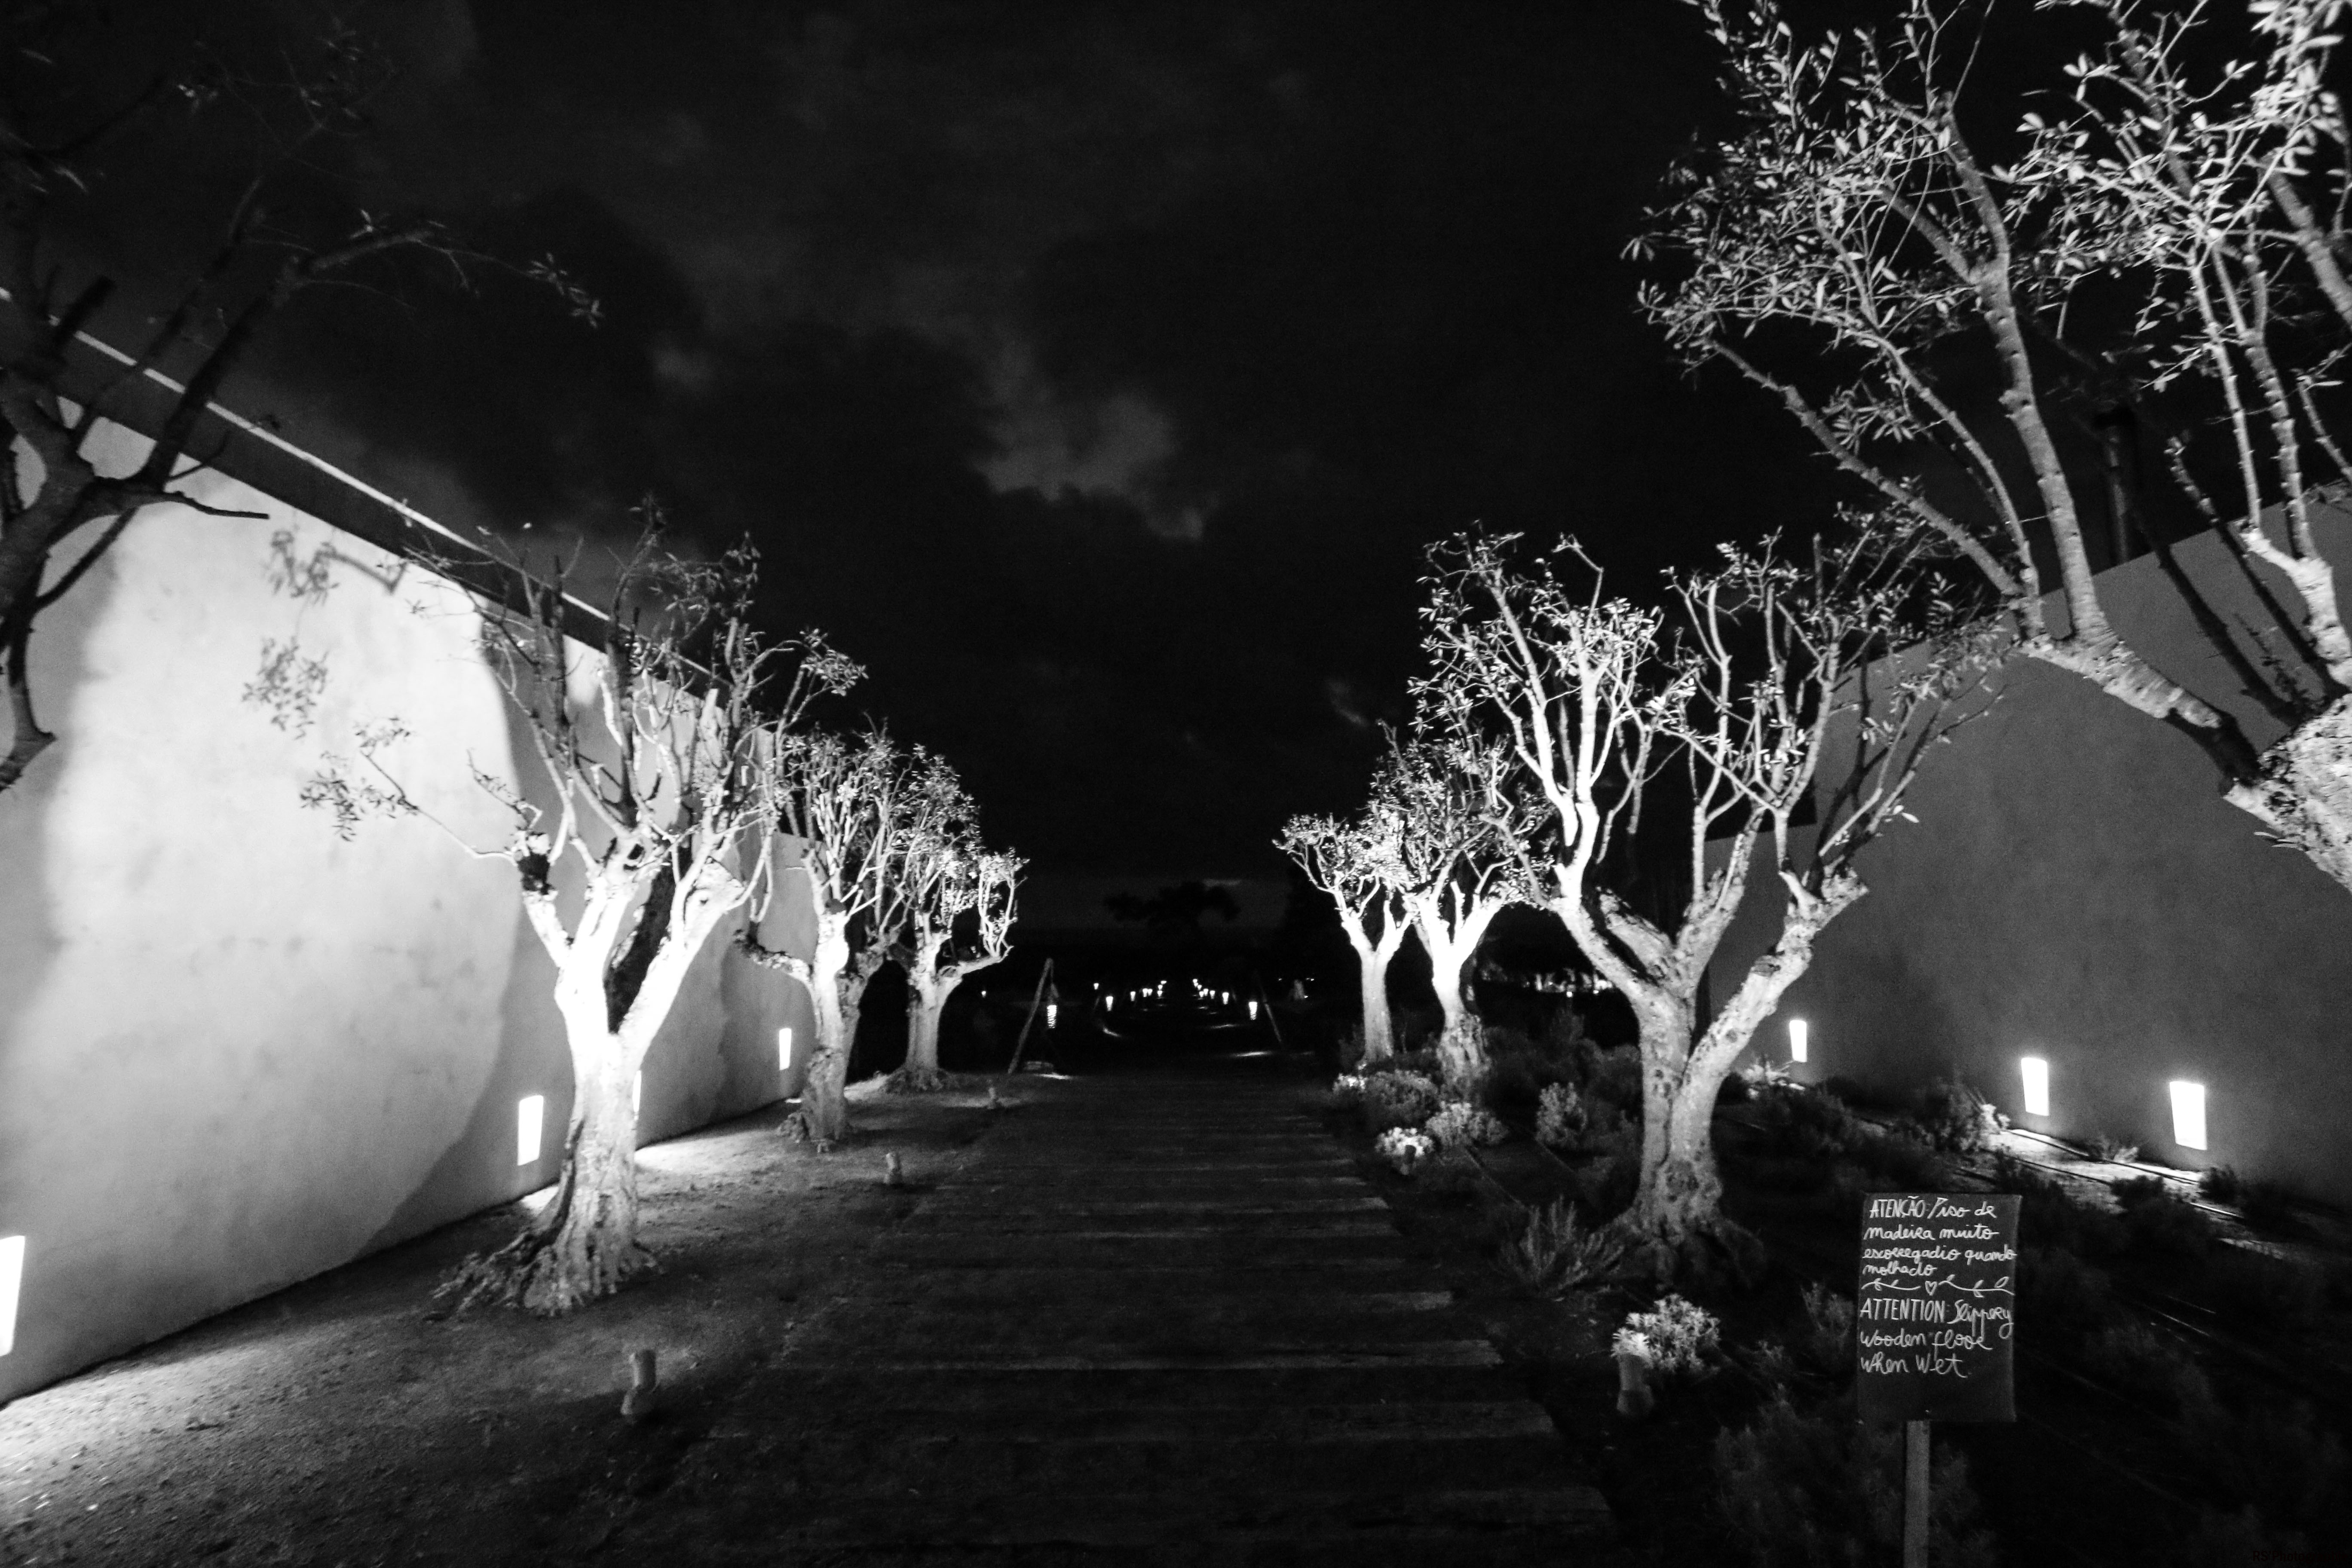 volvoXC4058-volvo-xc40-hotel-Areias do Seixos-Arnaud Demasier-RSPhotographie